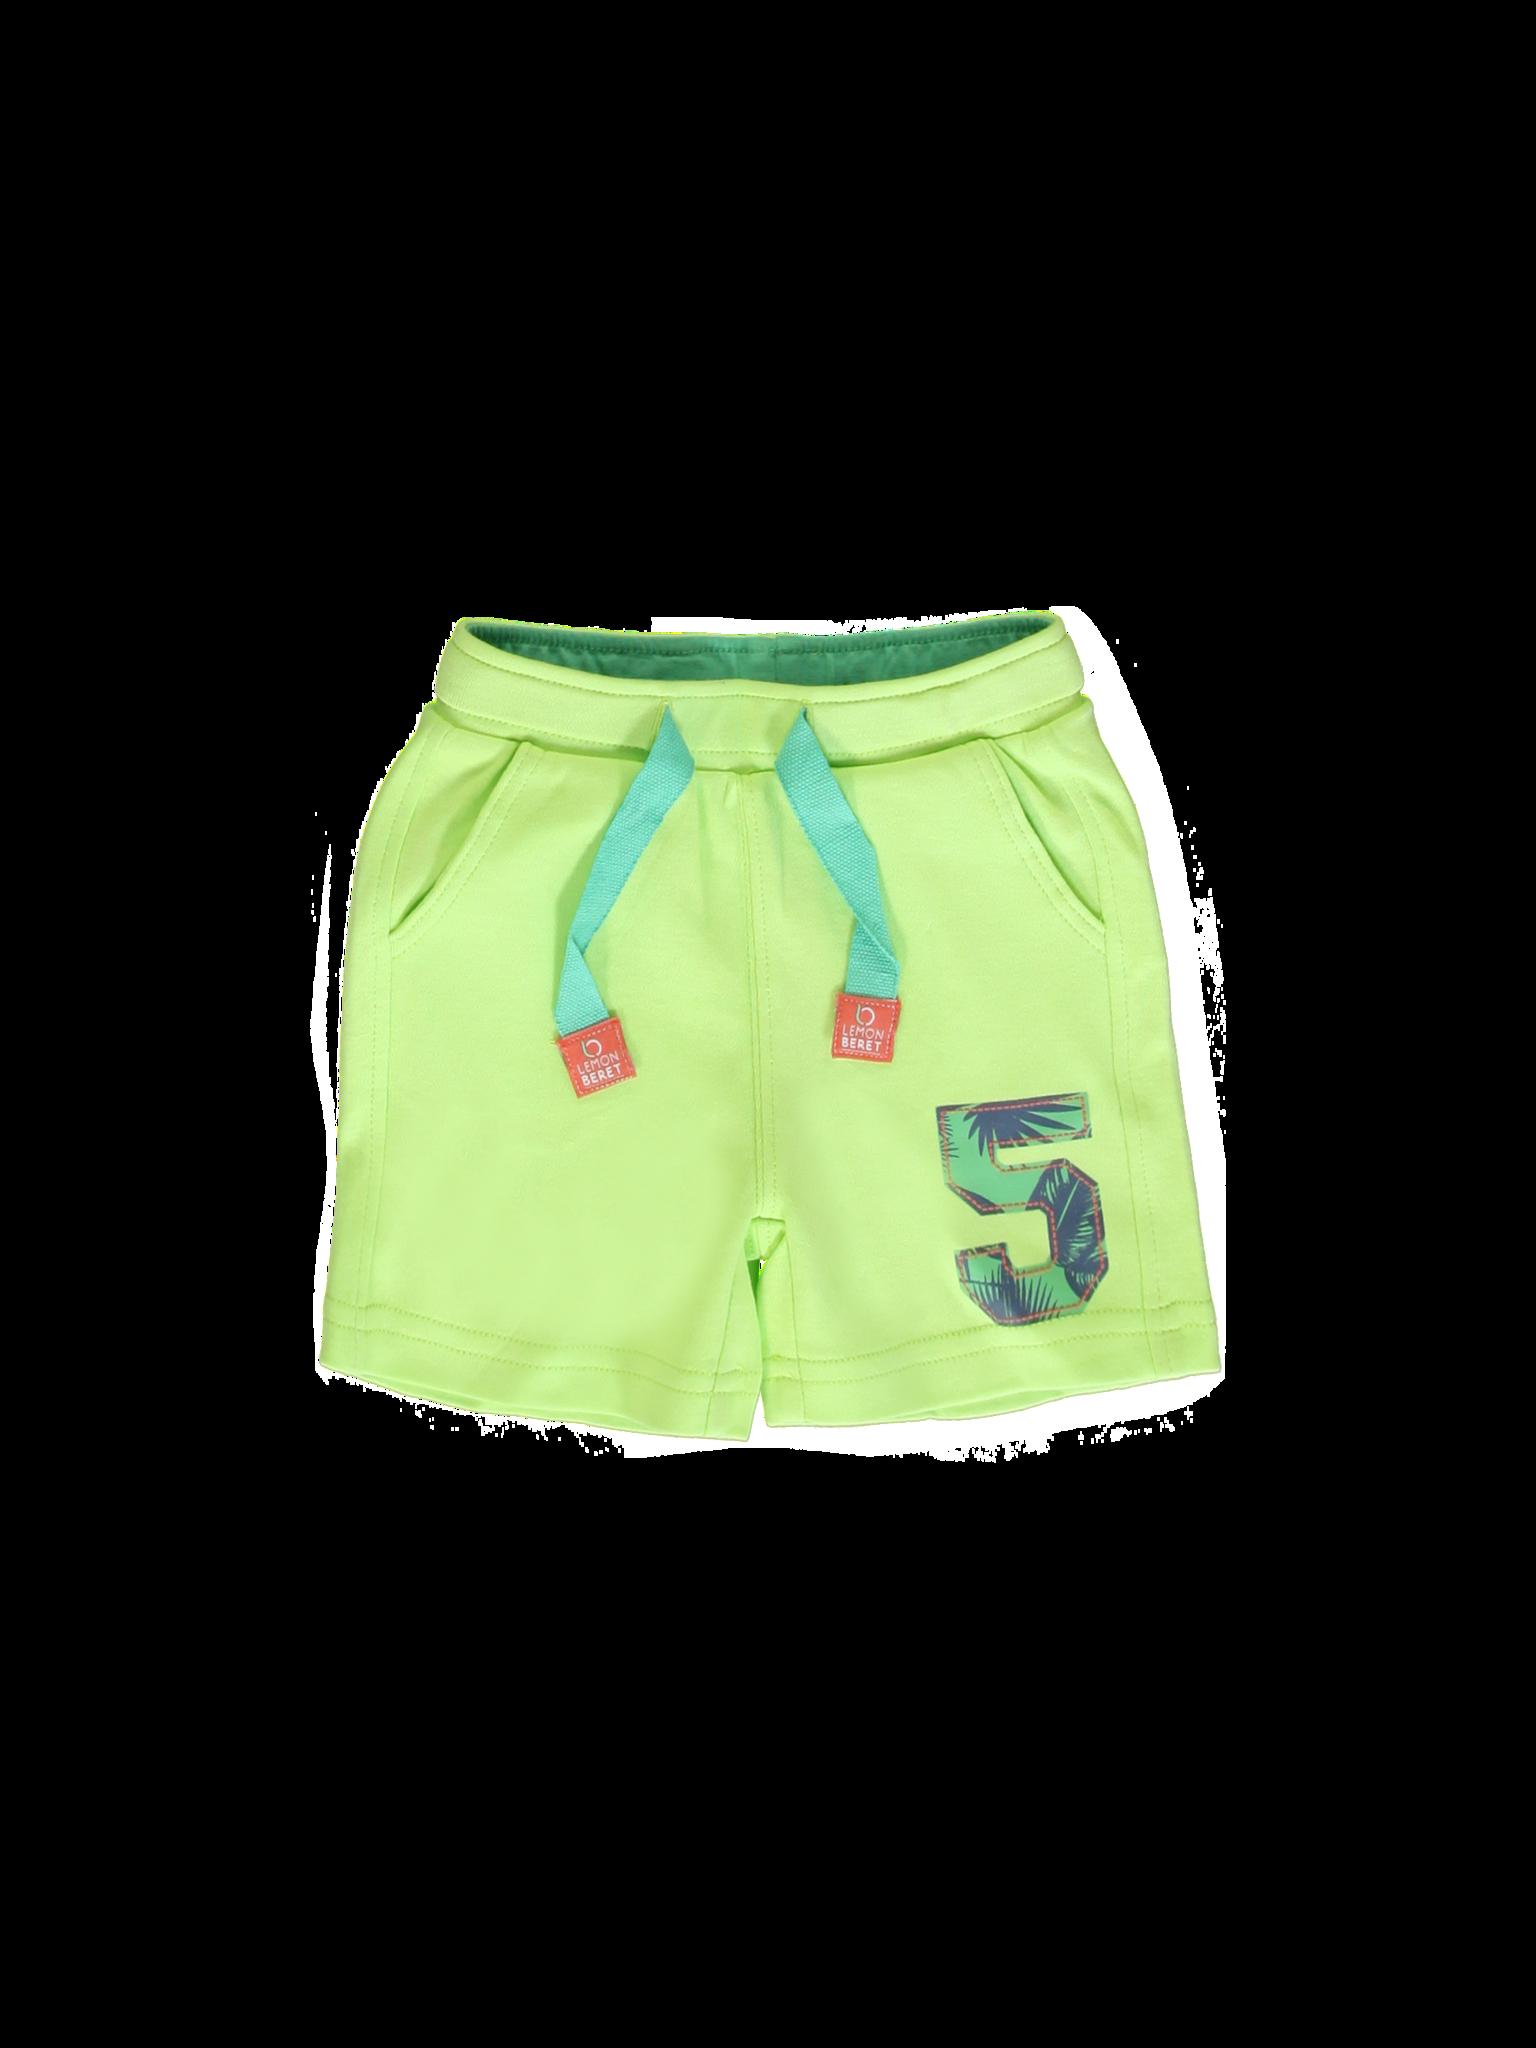 All Brands | Summerproducts Baby | Bermuda | 12 pcs/box